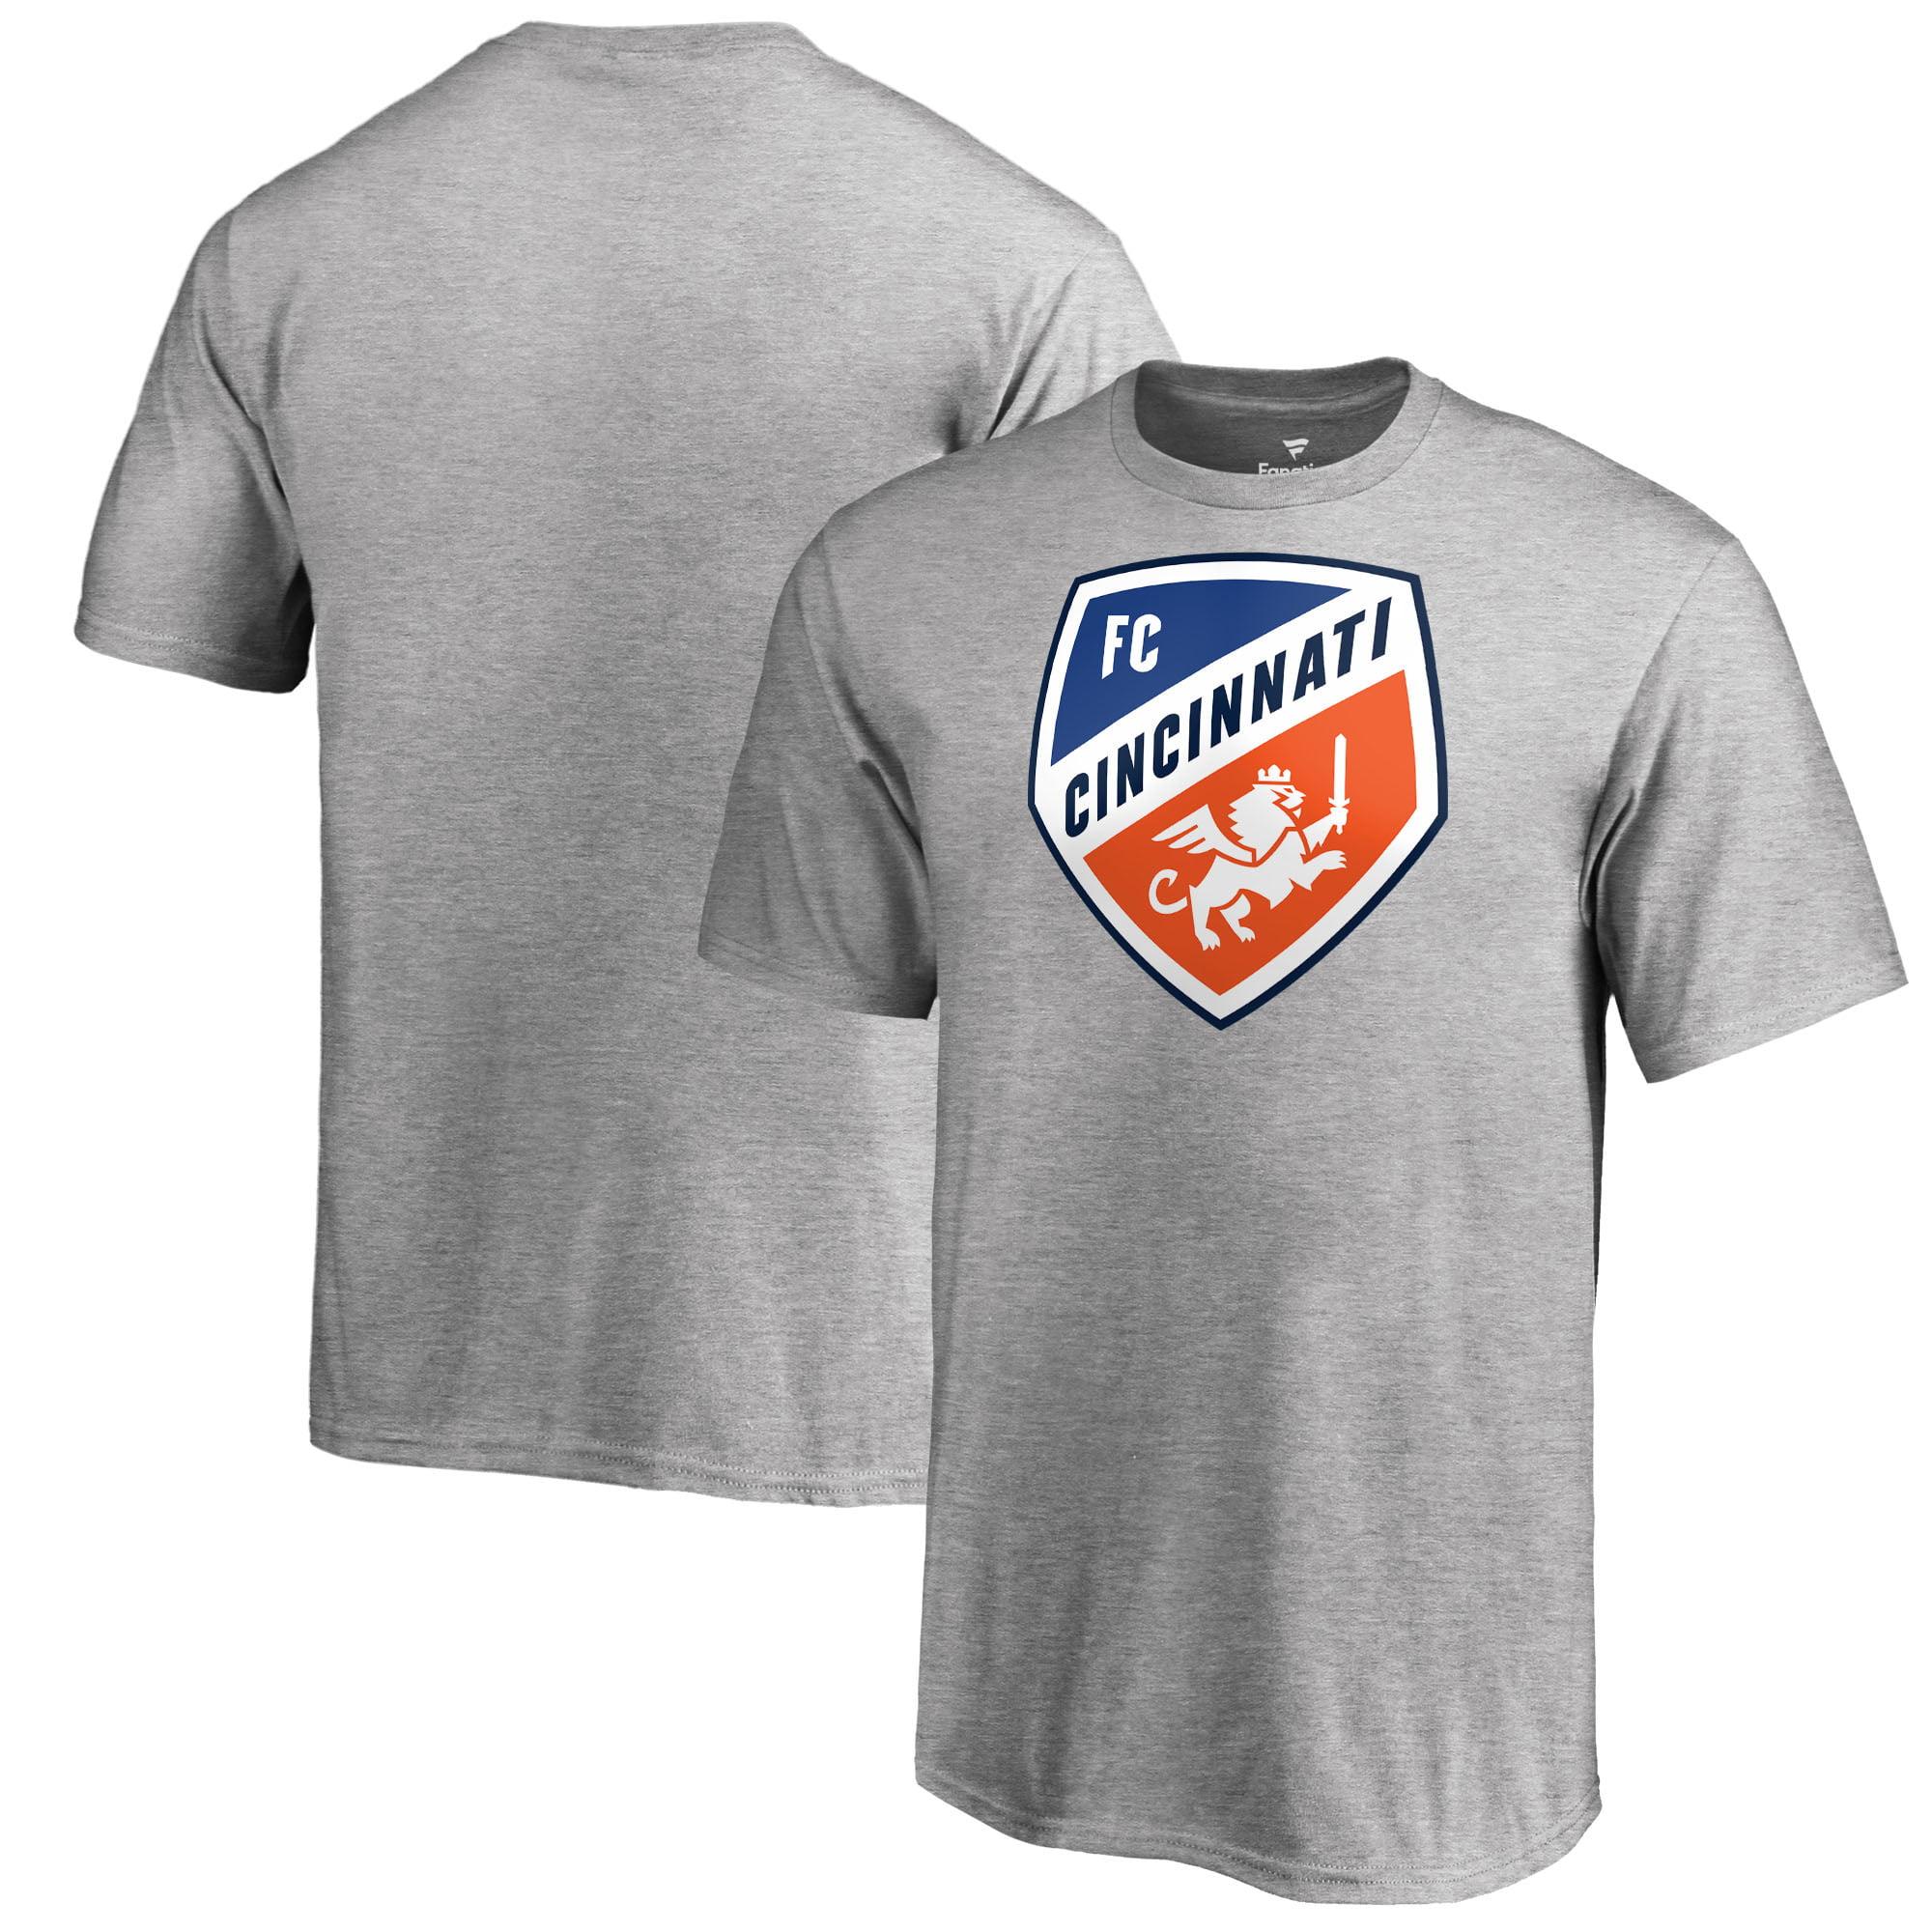 FC Cincinnati Fanatics Branded Youth Primary Logo T-Shirt - Heather Gray